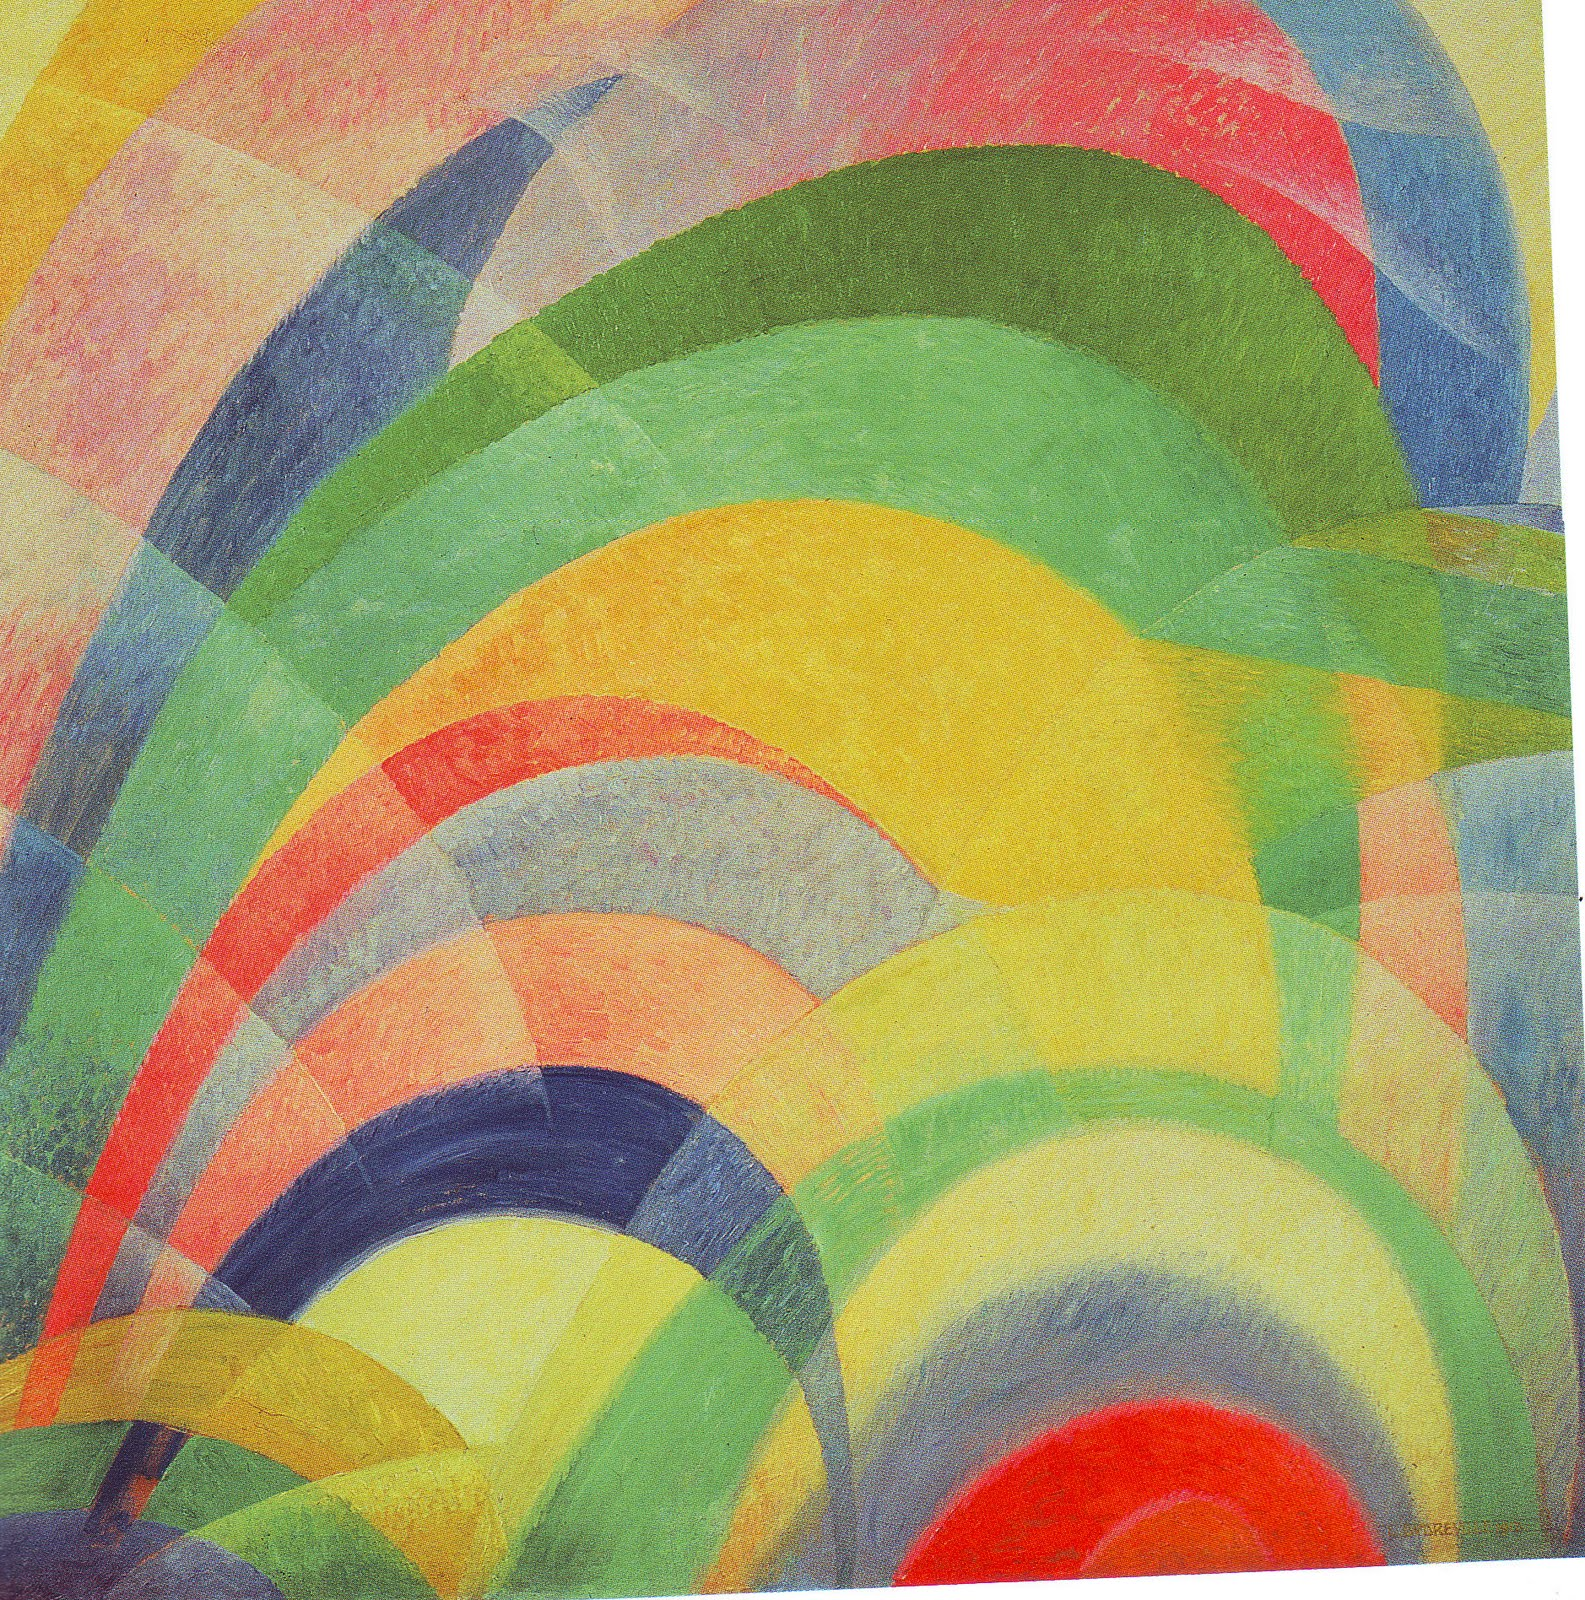 Jayde donna Lynn: Inspiration: Abstract expressionism/Futurism